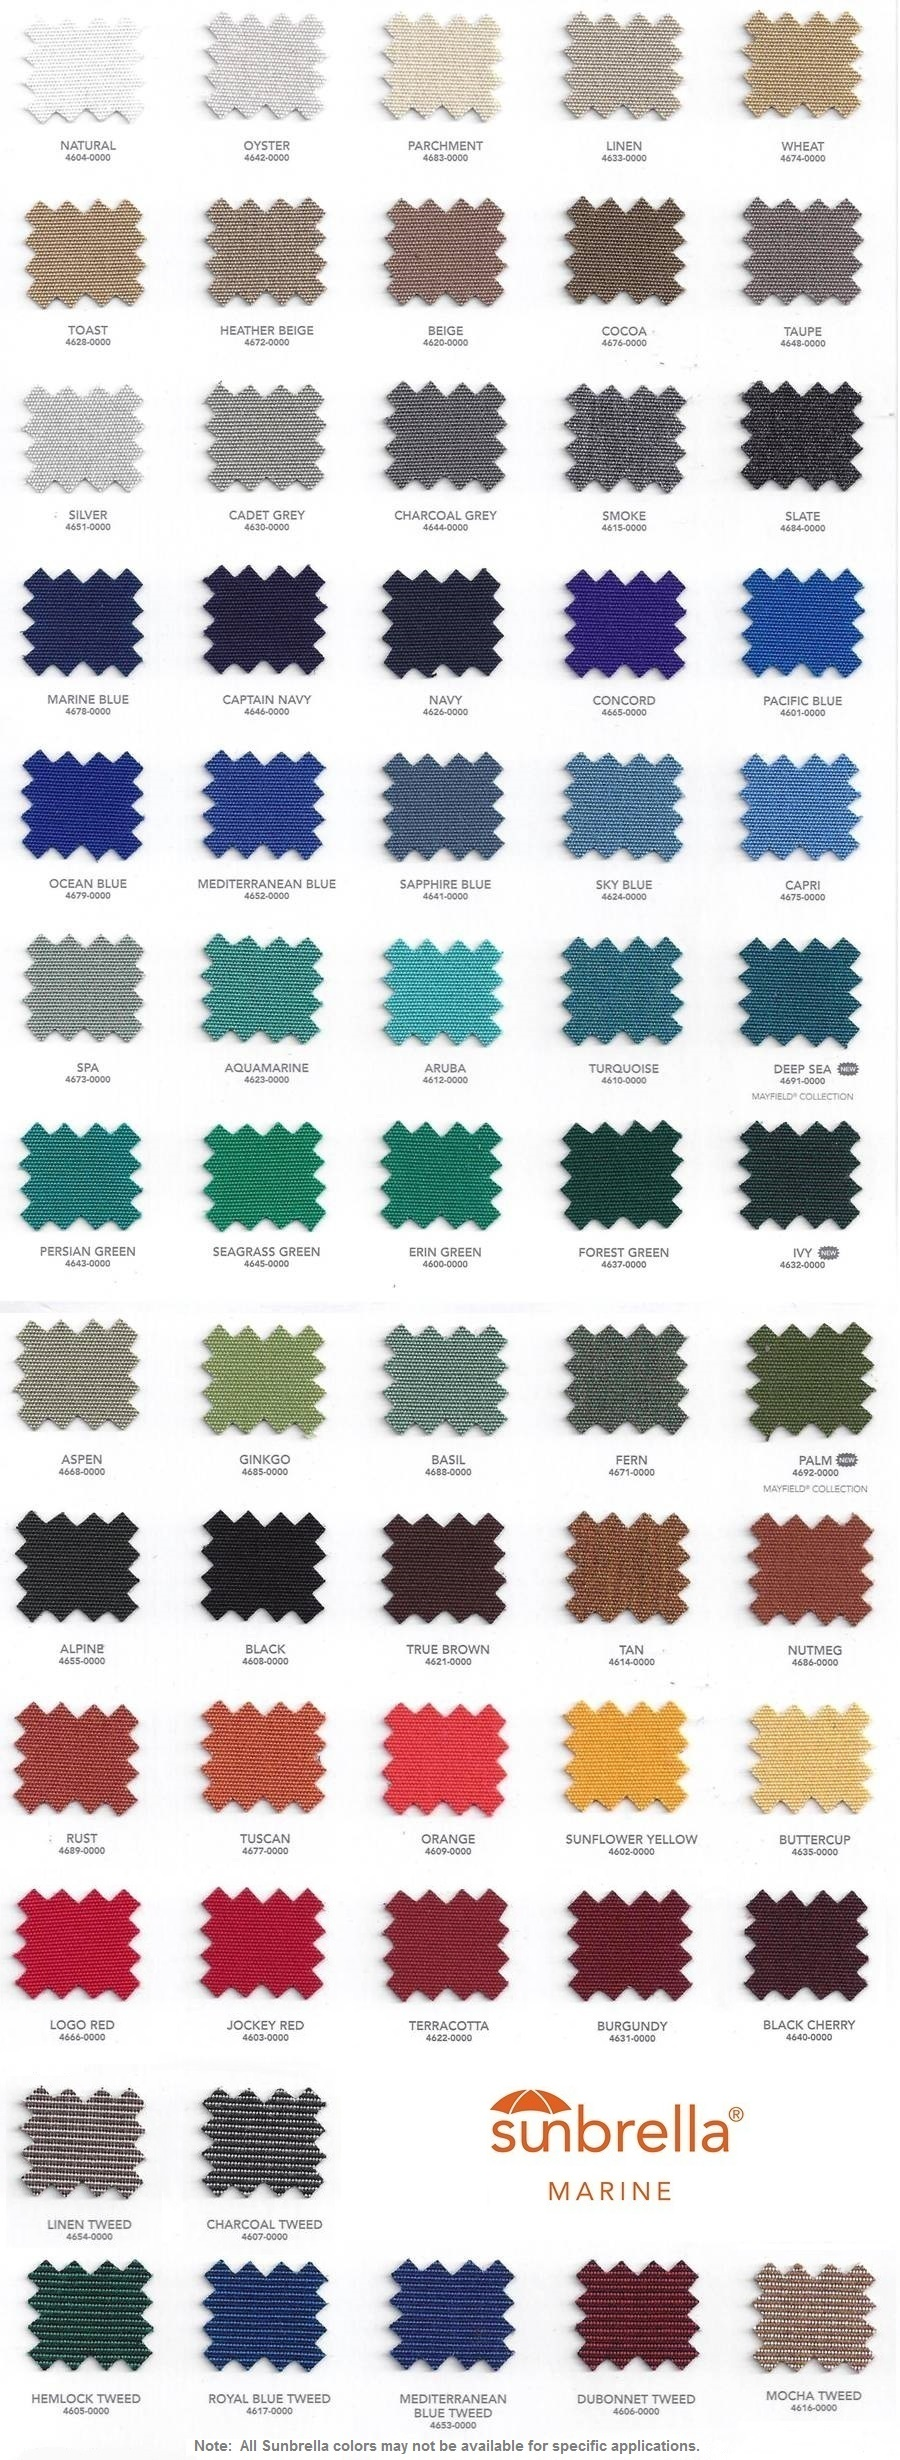 medium resolution of  sunbrella marine top fabric colors boat